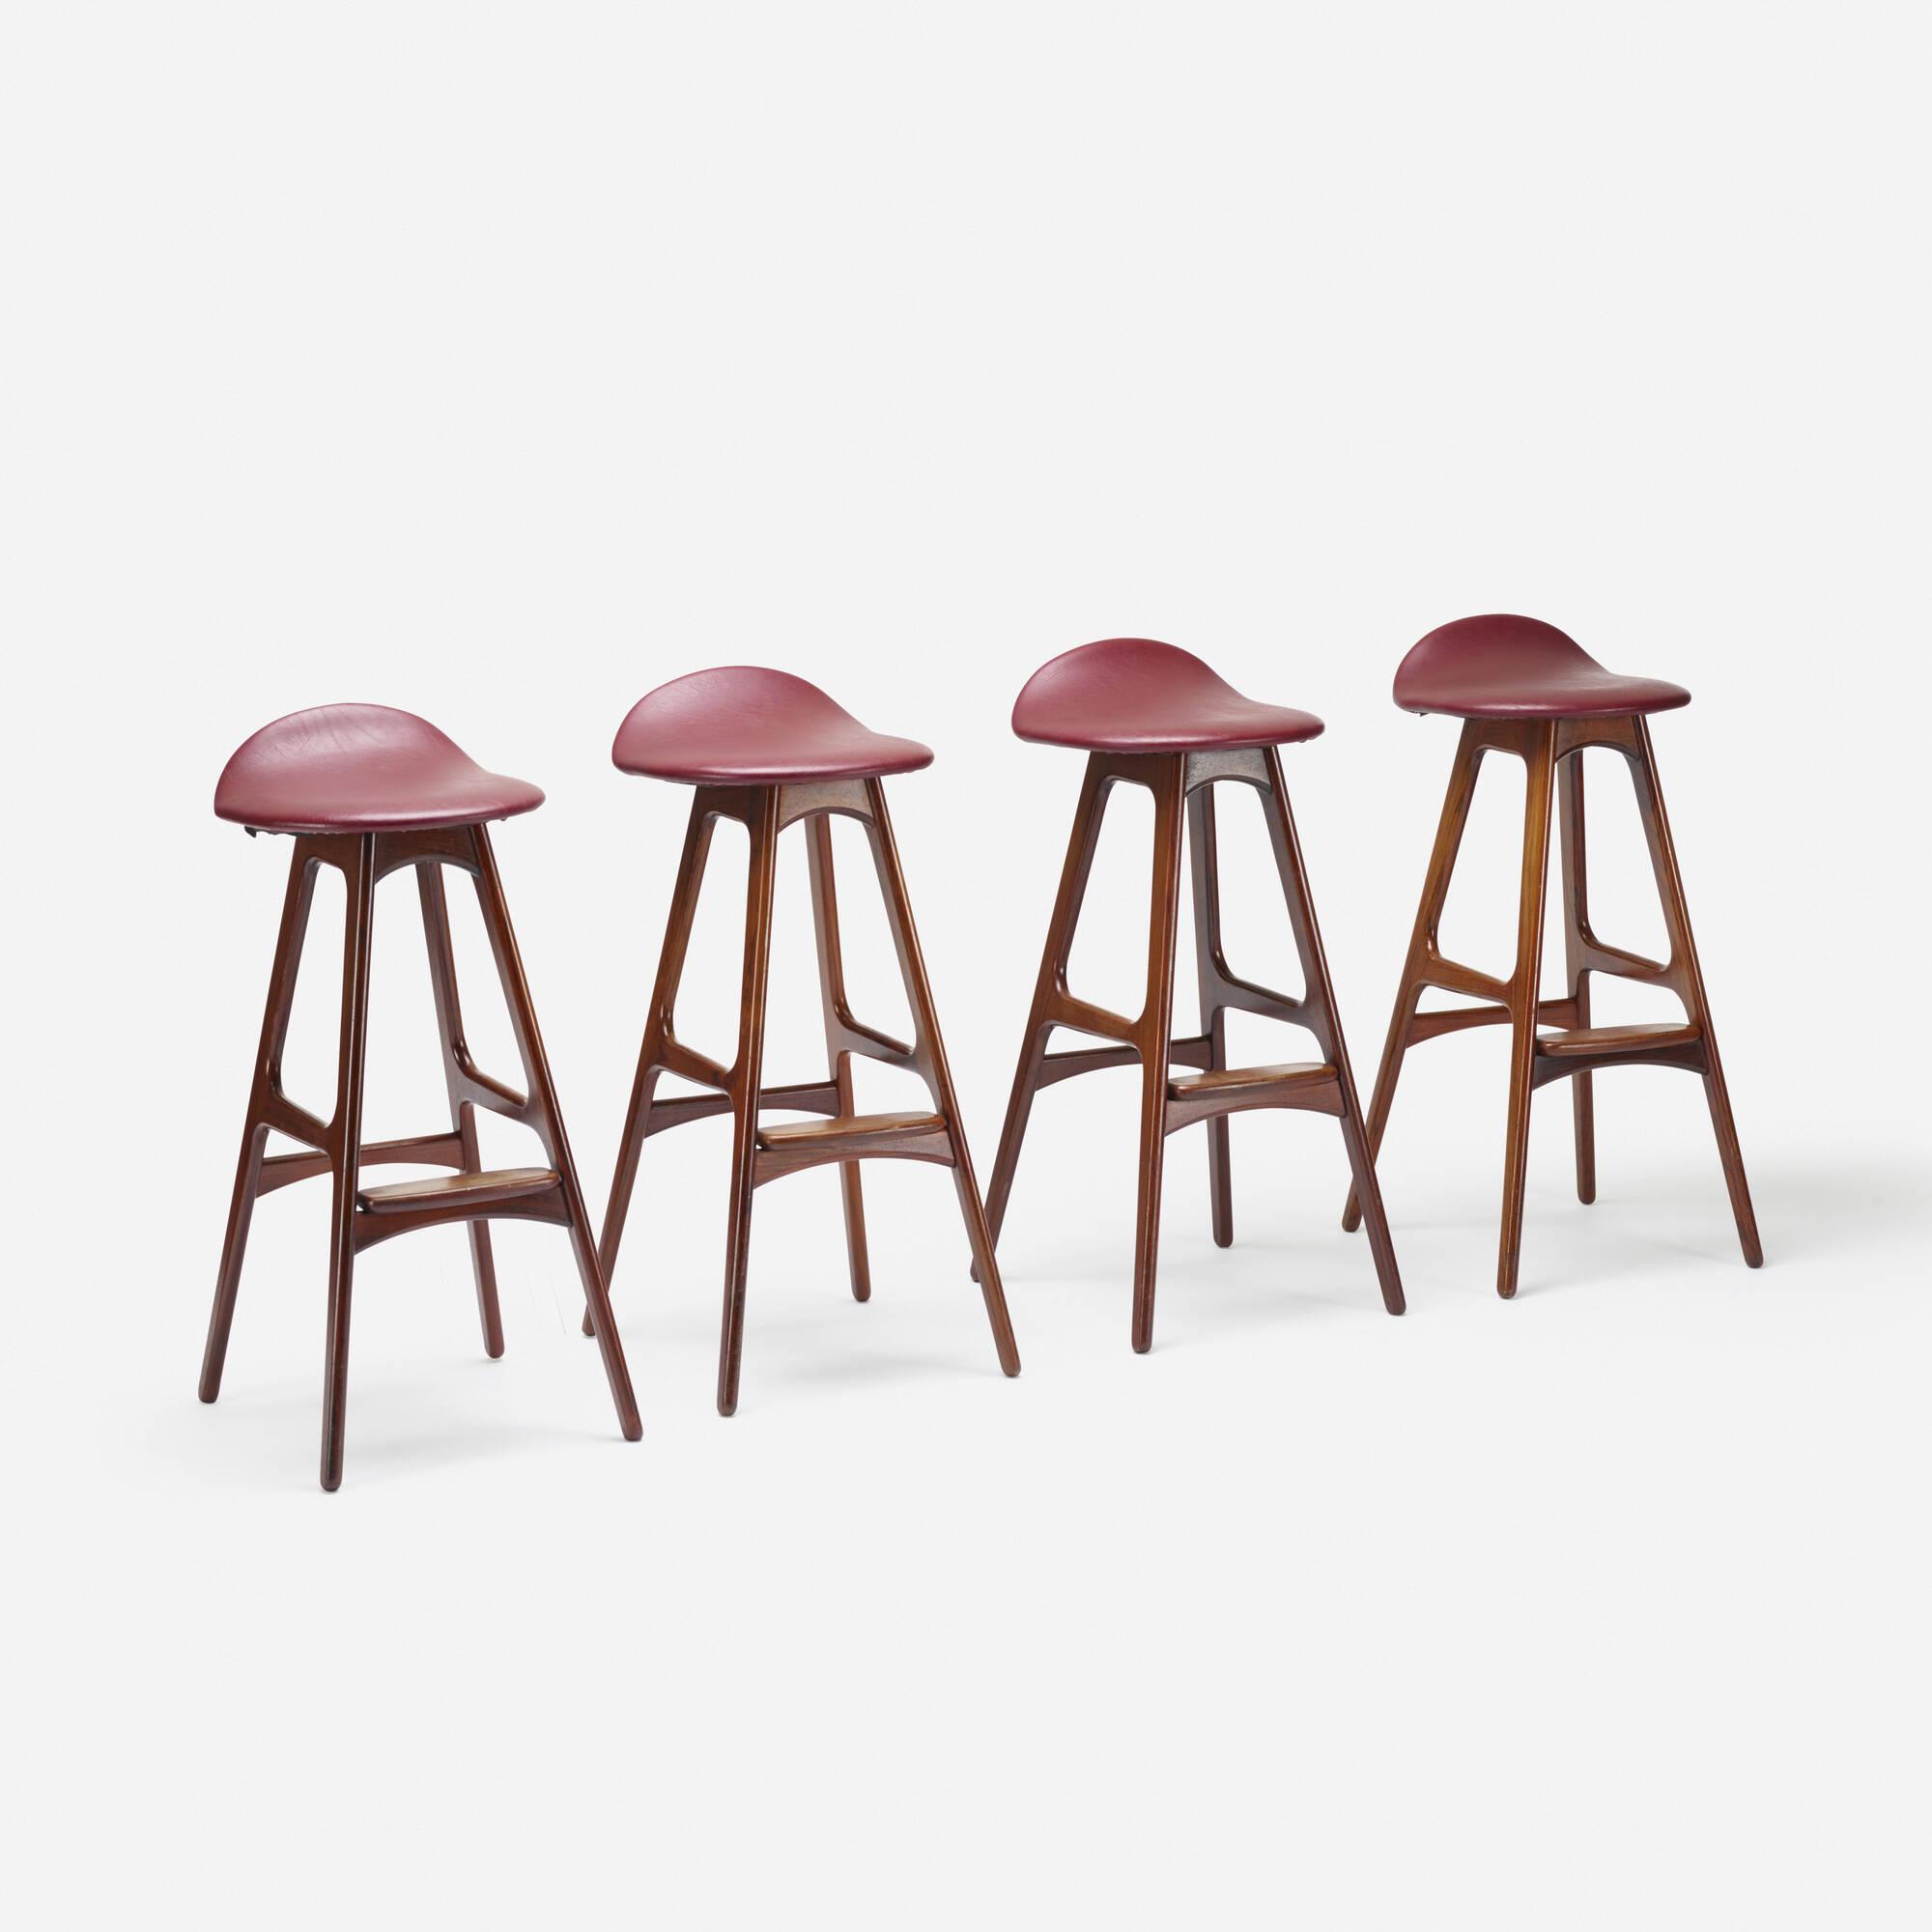 163: Erik Buck / stools model OD61, set of four (1 of 3)